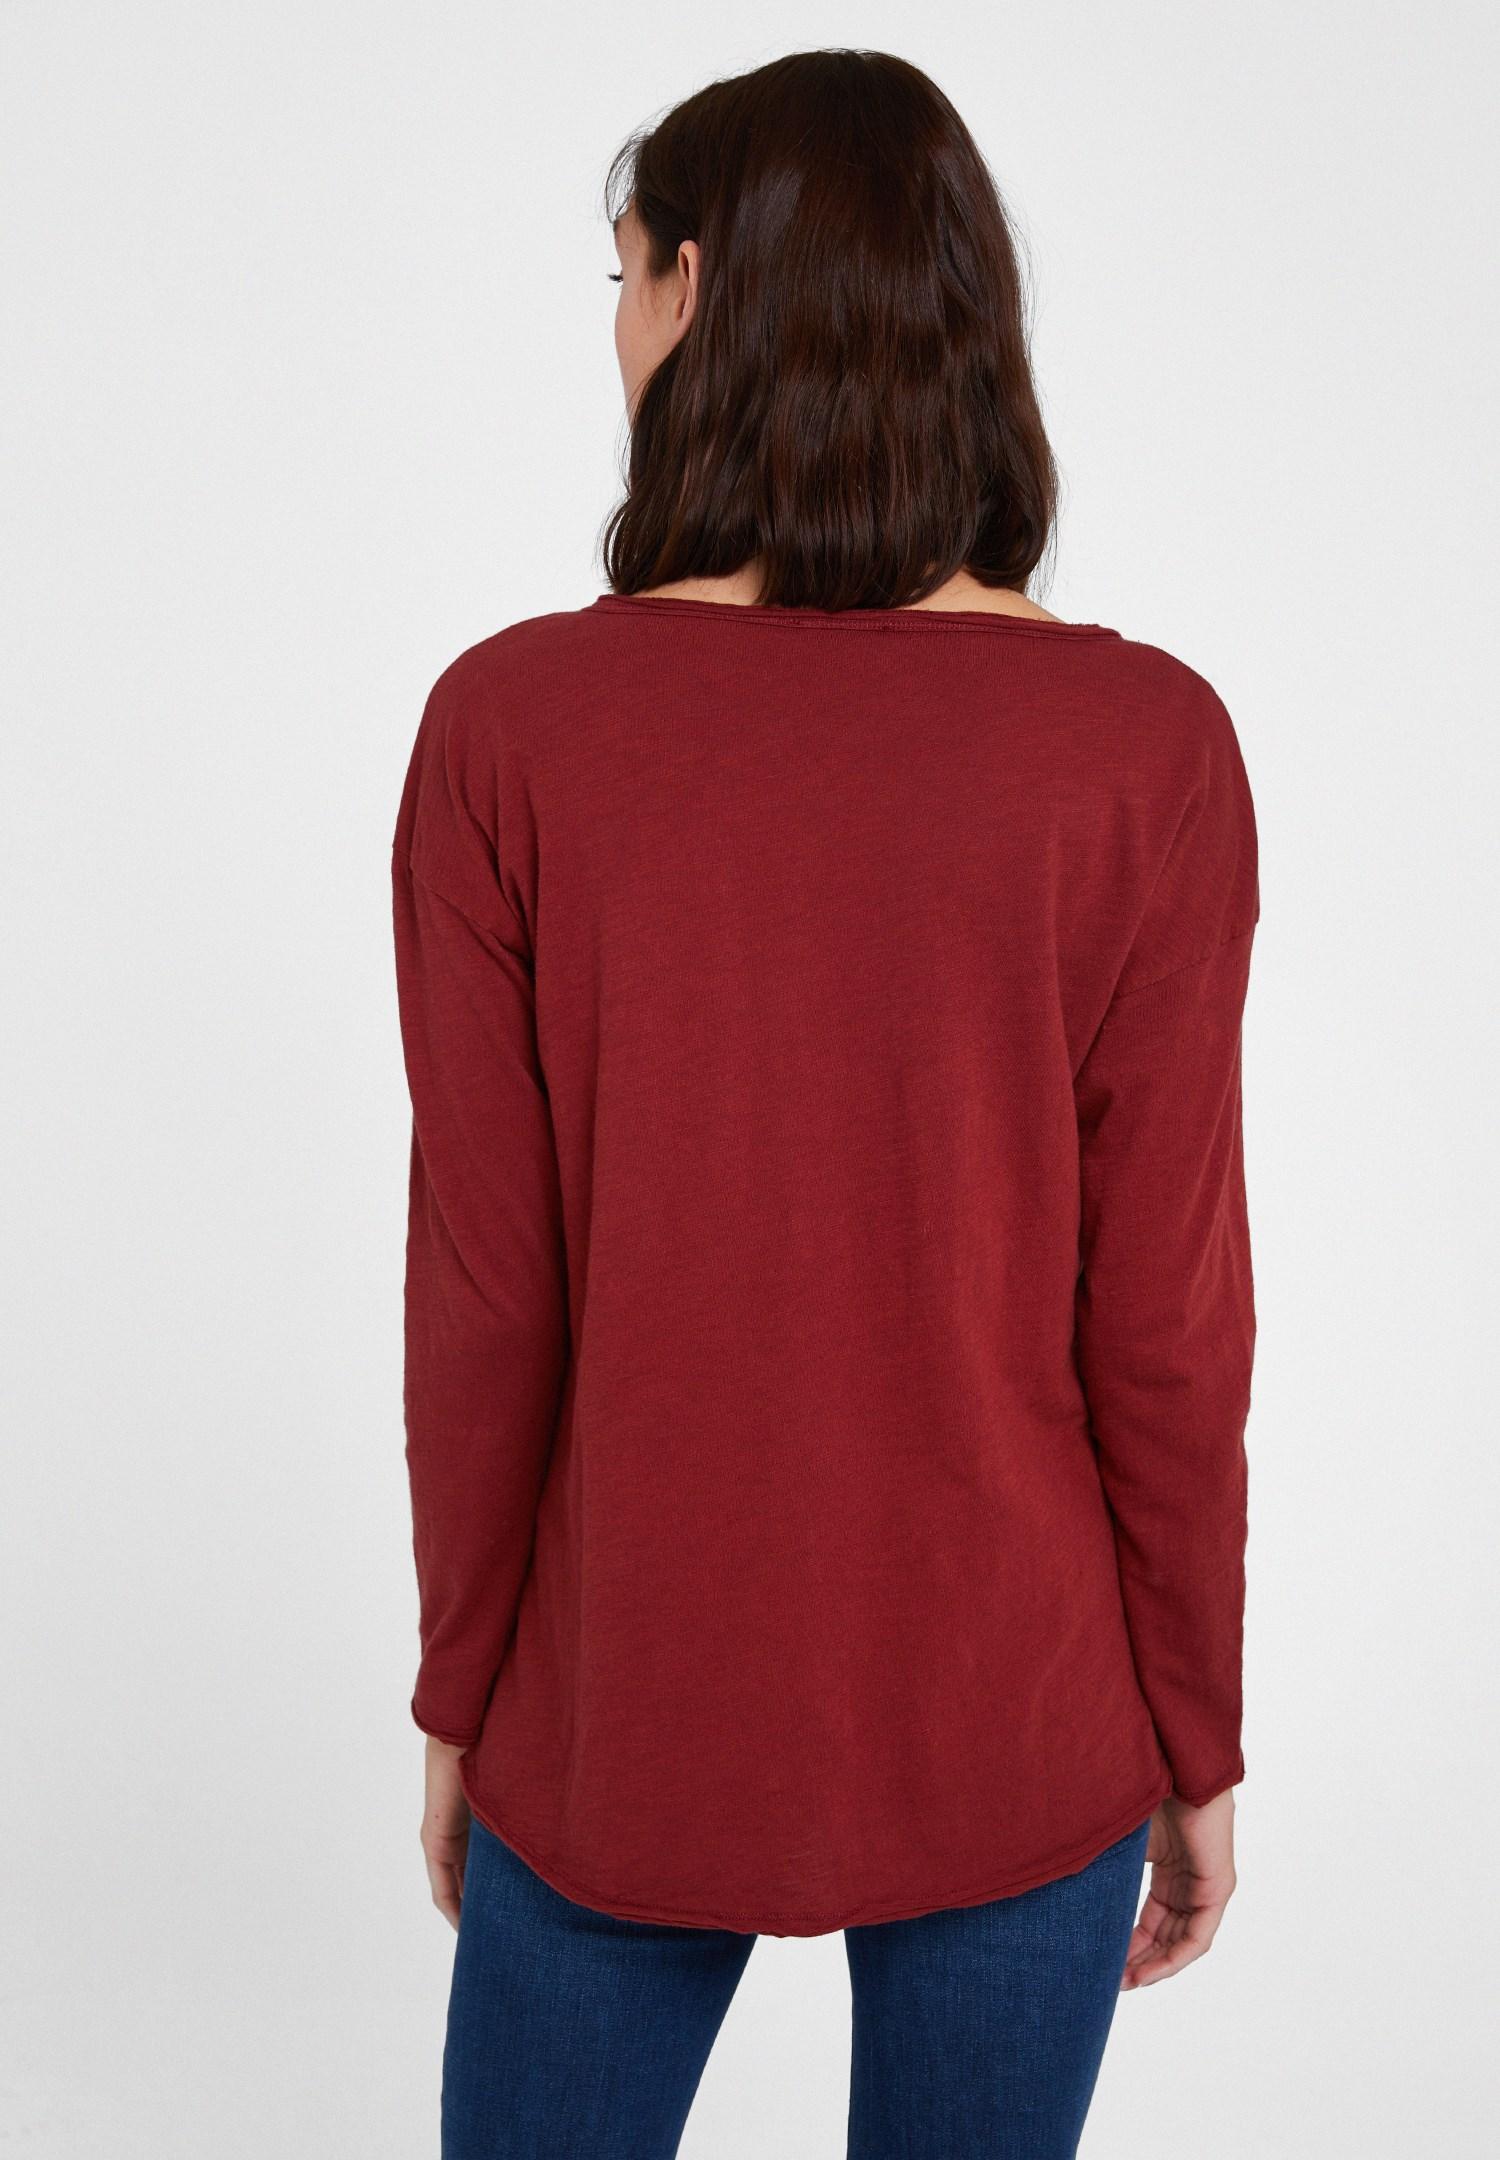 Bayan Kırmızı Bisiklet Yaka Pamuklu Tişört